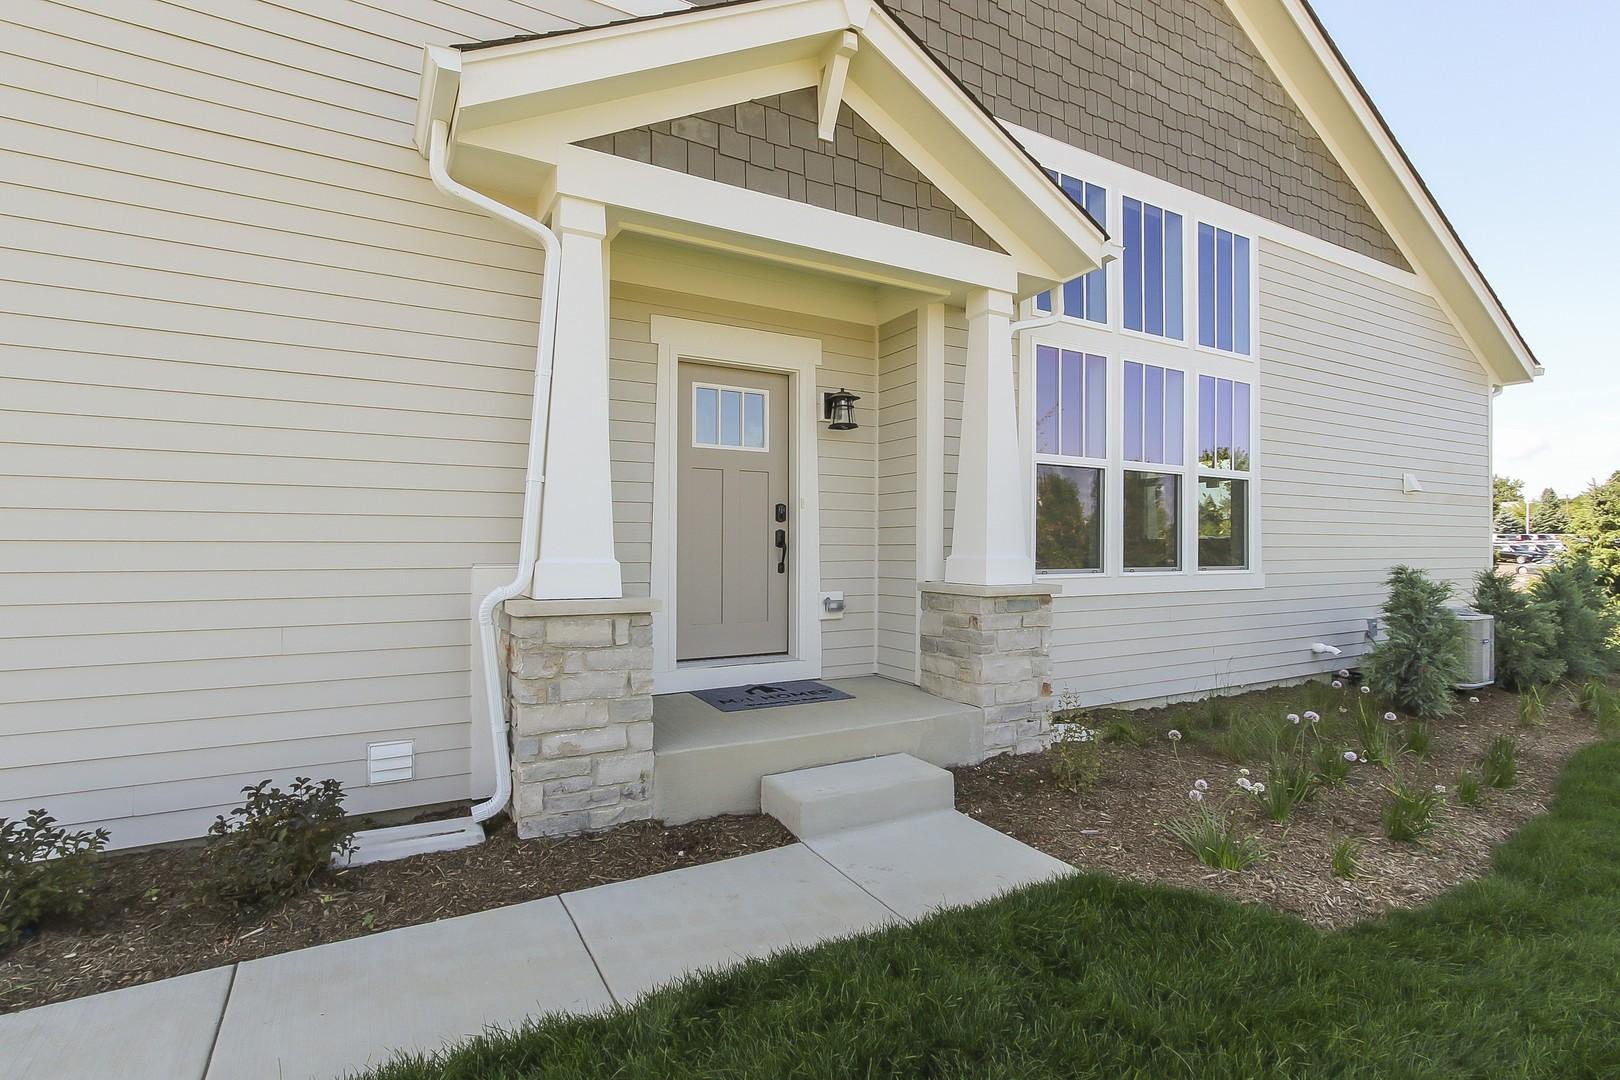 1450 Palmer Lot #18.03, BARRINGTON, Illinois, 60010